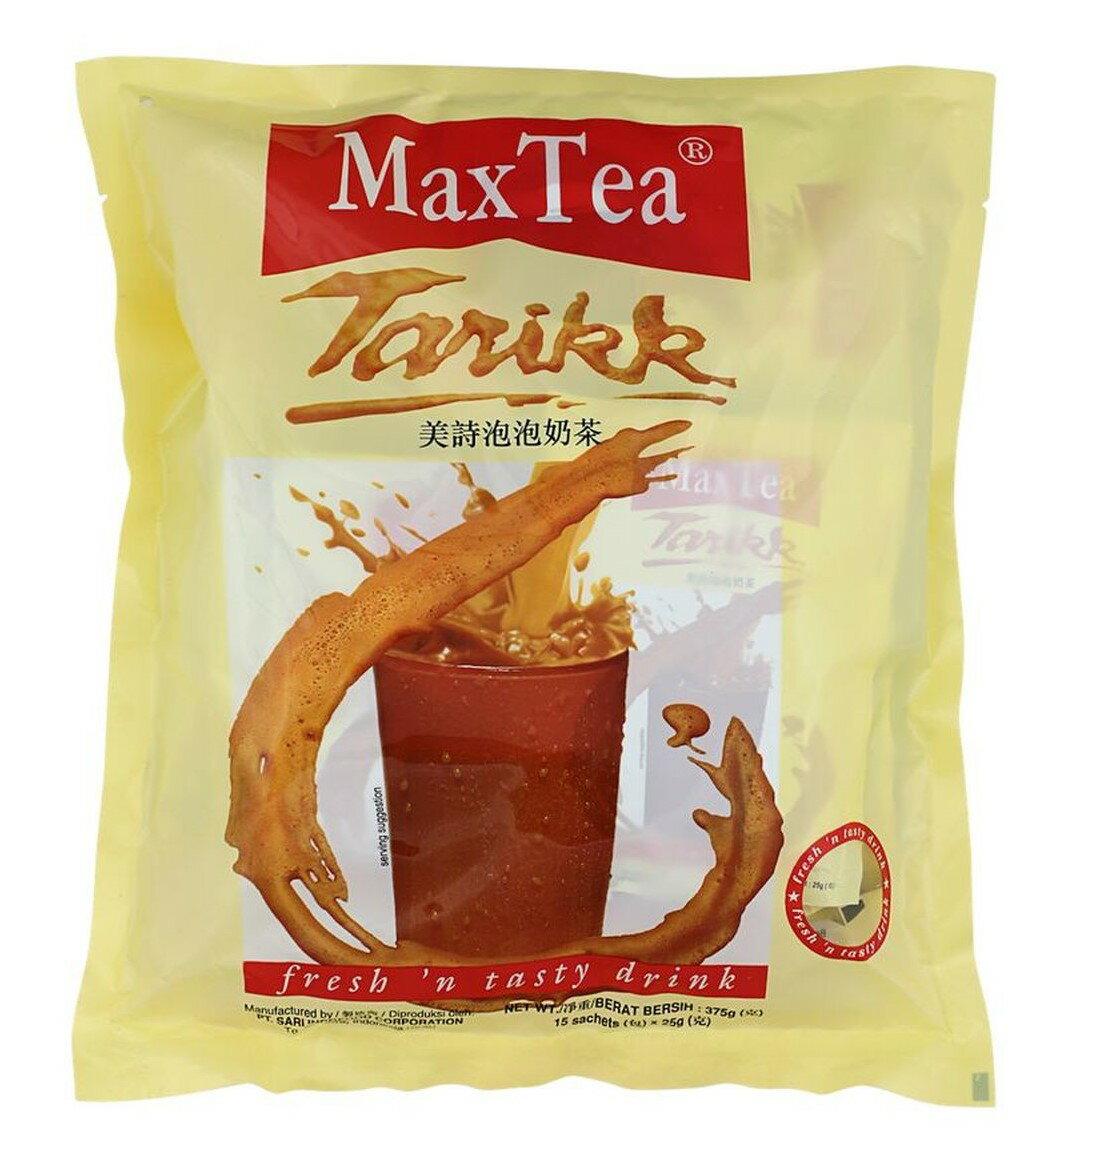 印尼即溶奶茶  MaxTea Tarikk INCOFOOD 25gm x 25